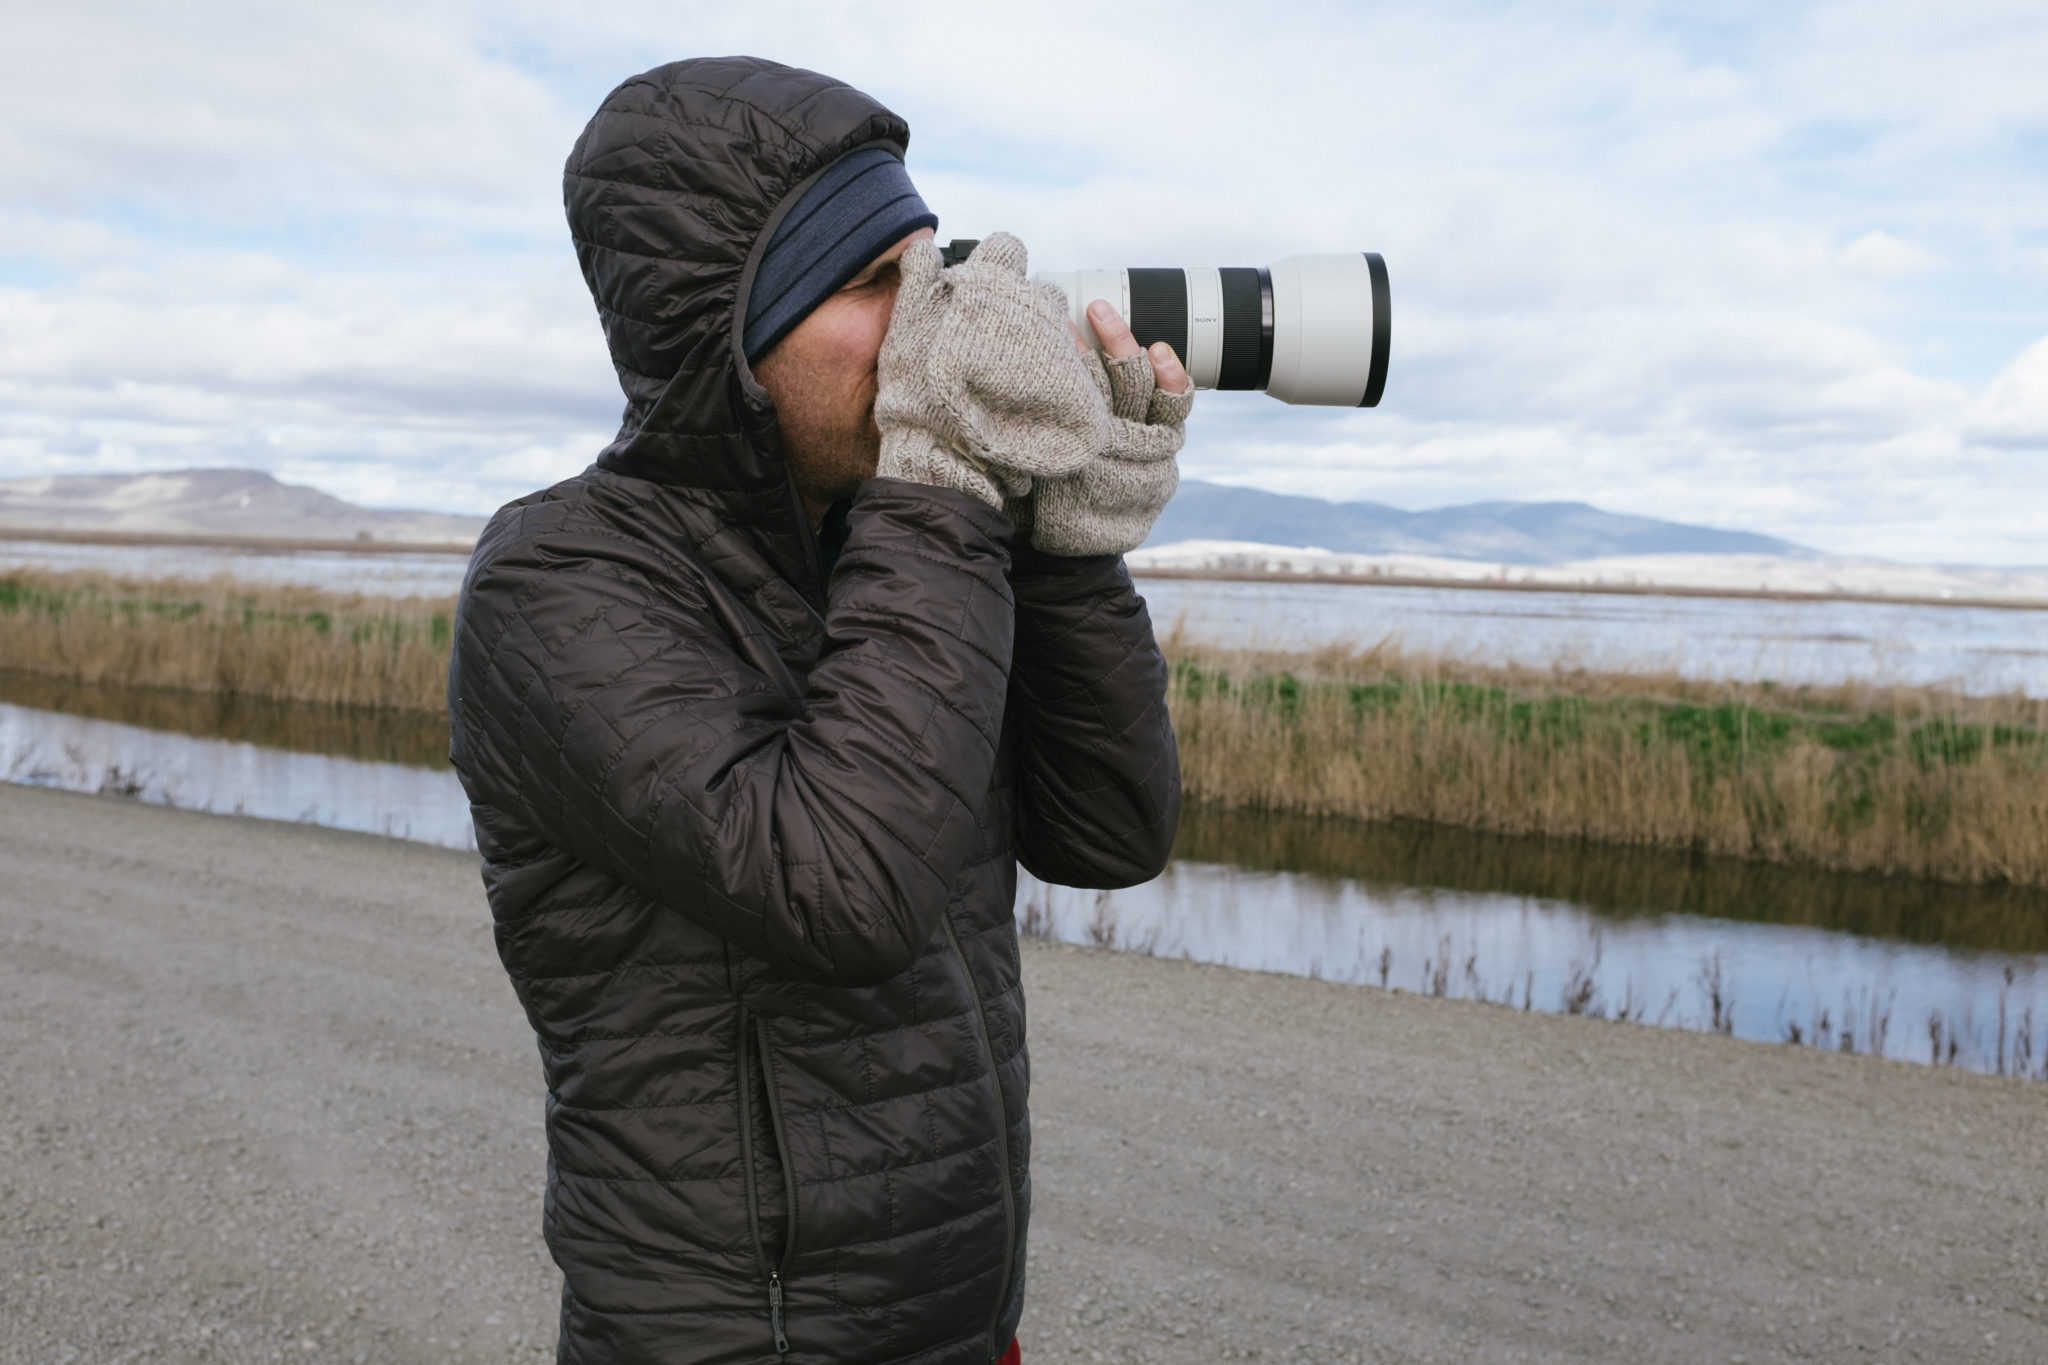 Discover Siskiyou Podcast featuring: Birding photography - Tulelake, CA